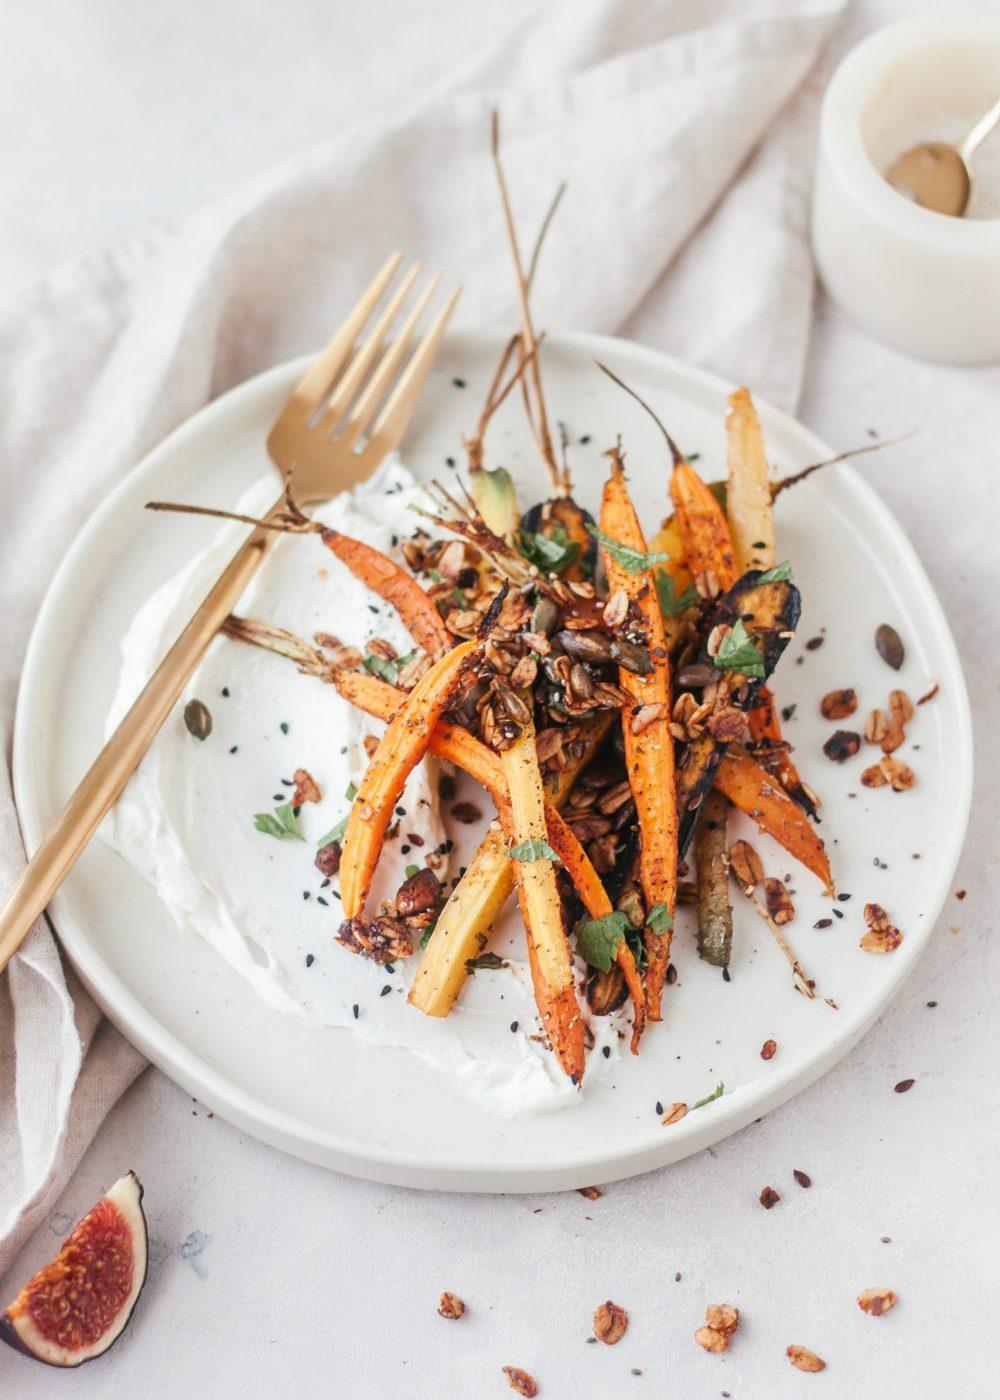 Crunchy wortels met whipped feta